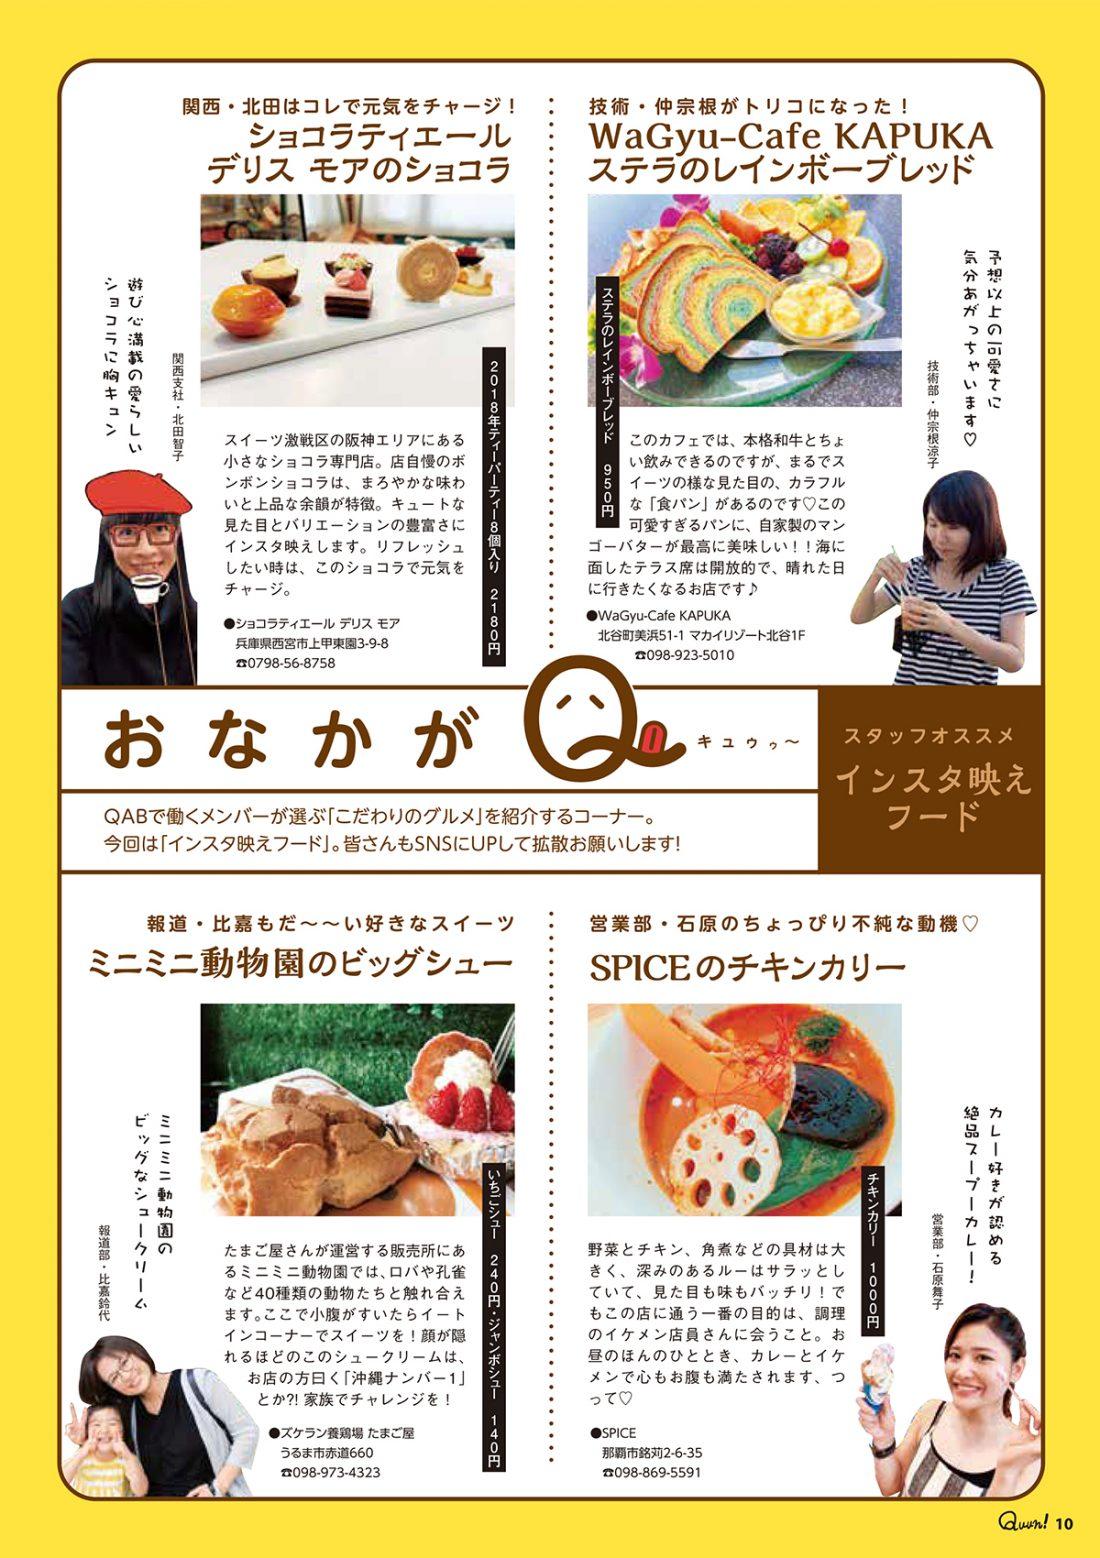 https://www.qab.co.jp/qgoro/wp-content/uploads/quun_0912-1100x1558.jpg